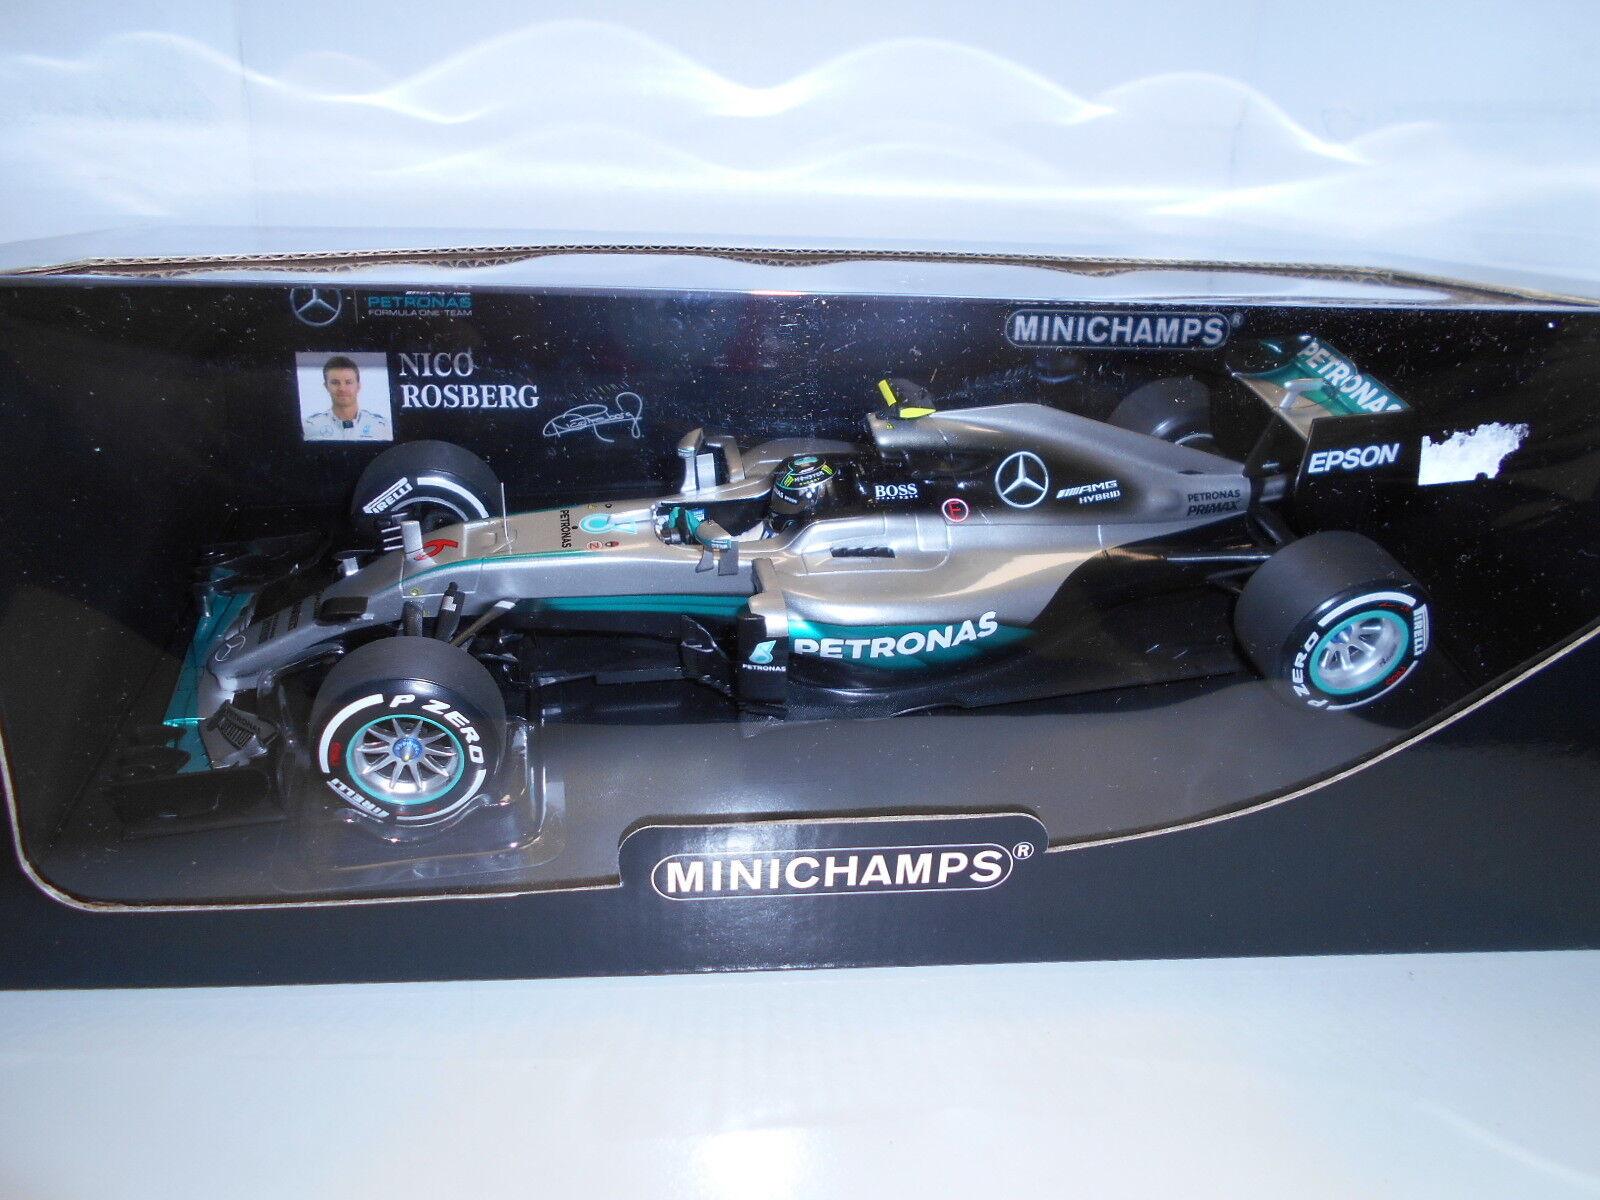 MIN110160006 by MINICHAMPS MERCEDES GP F1 W07  6 N.ROSBERG 2016 1 18